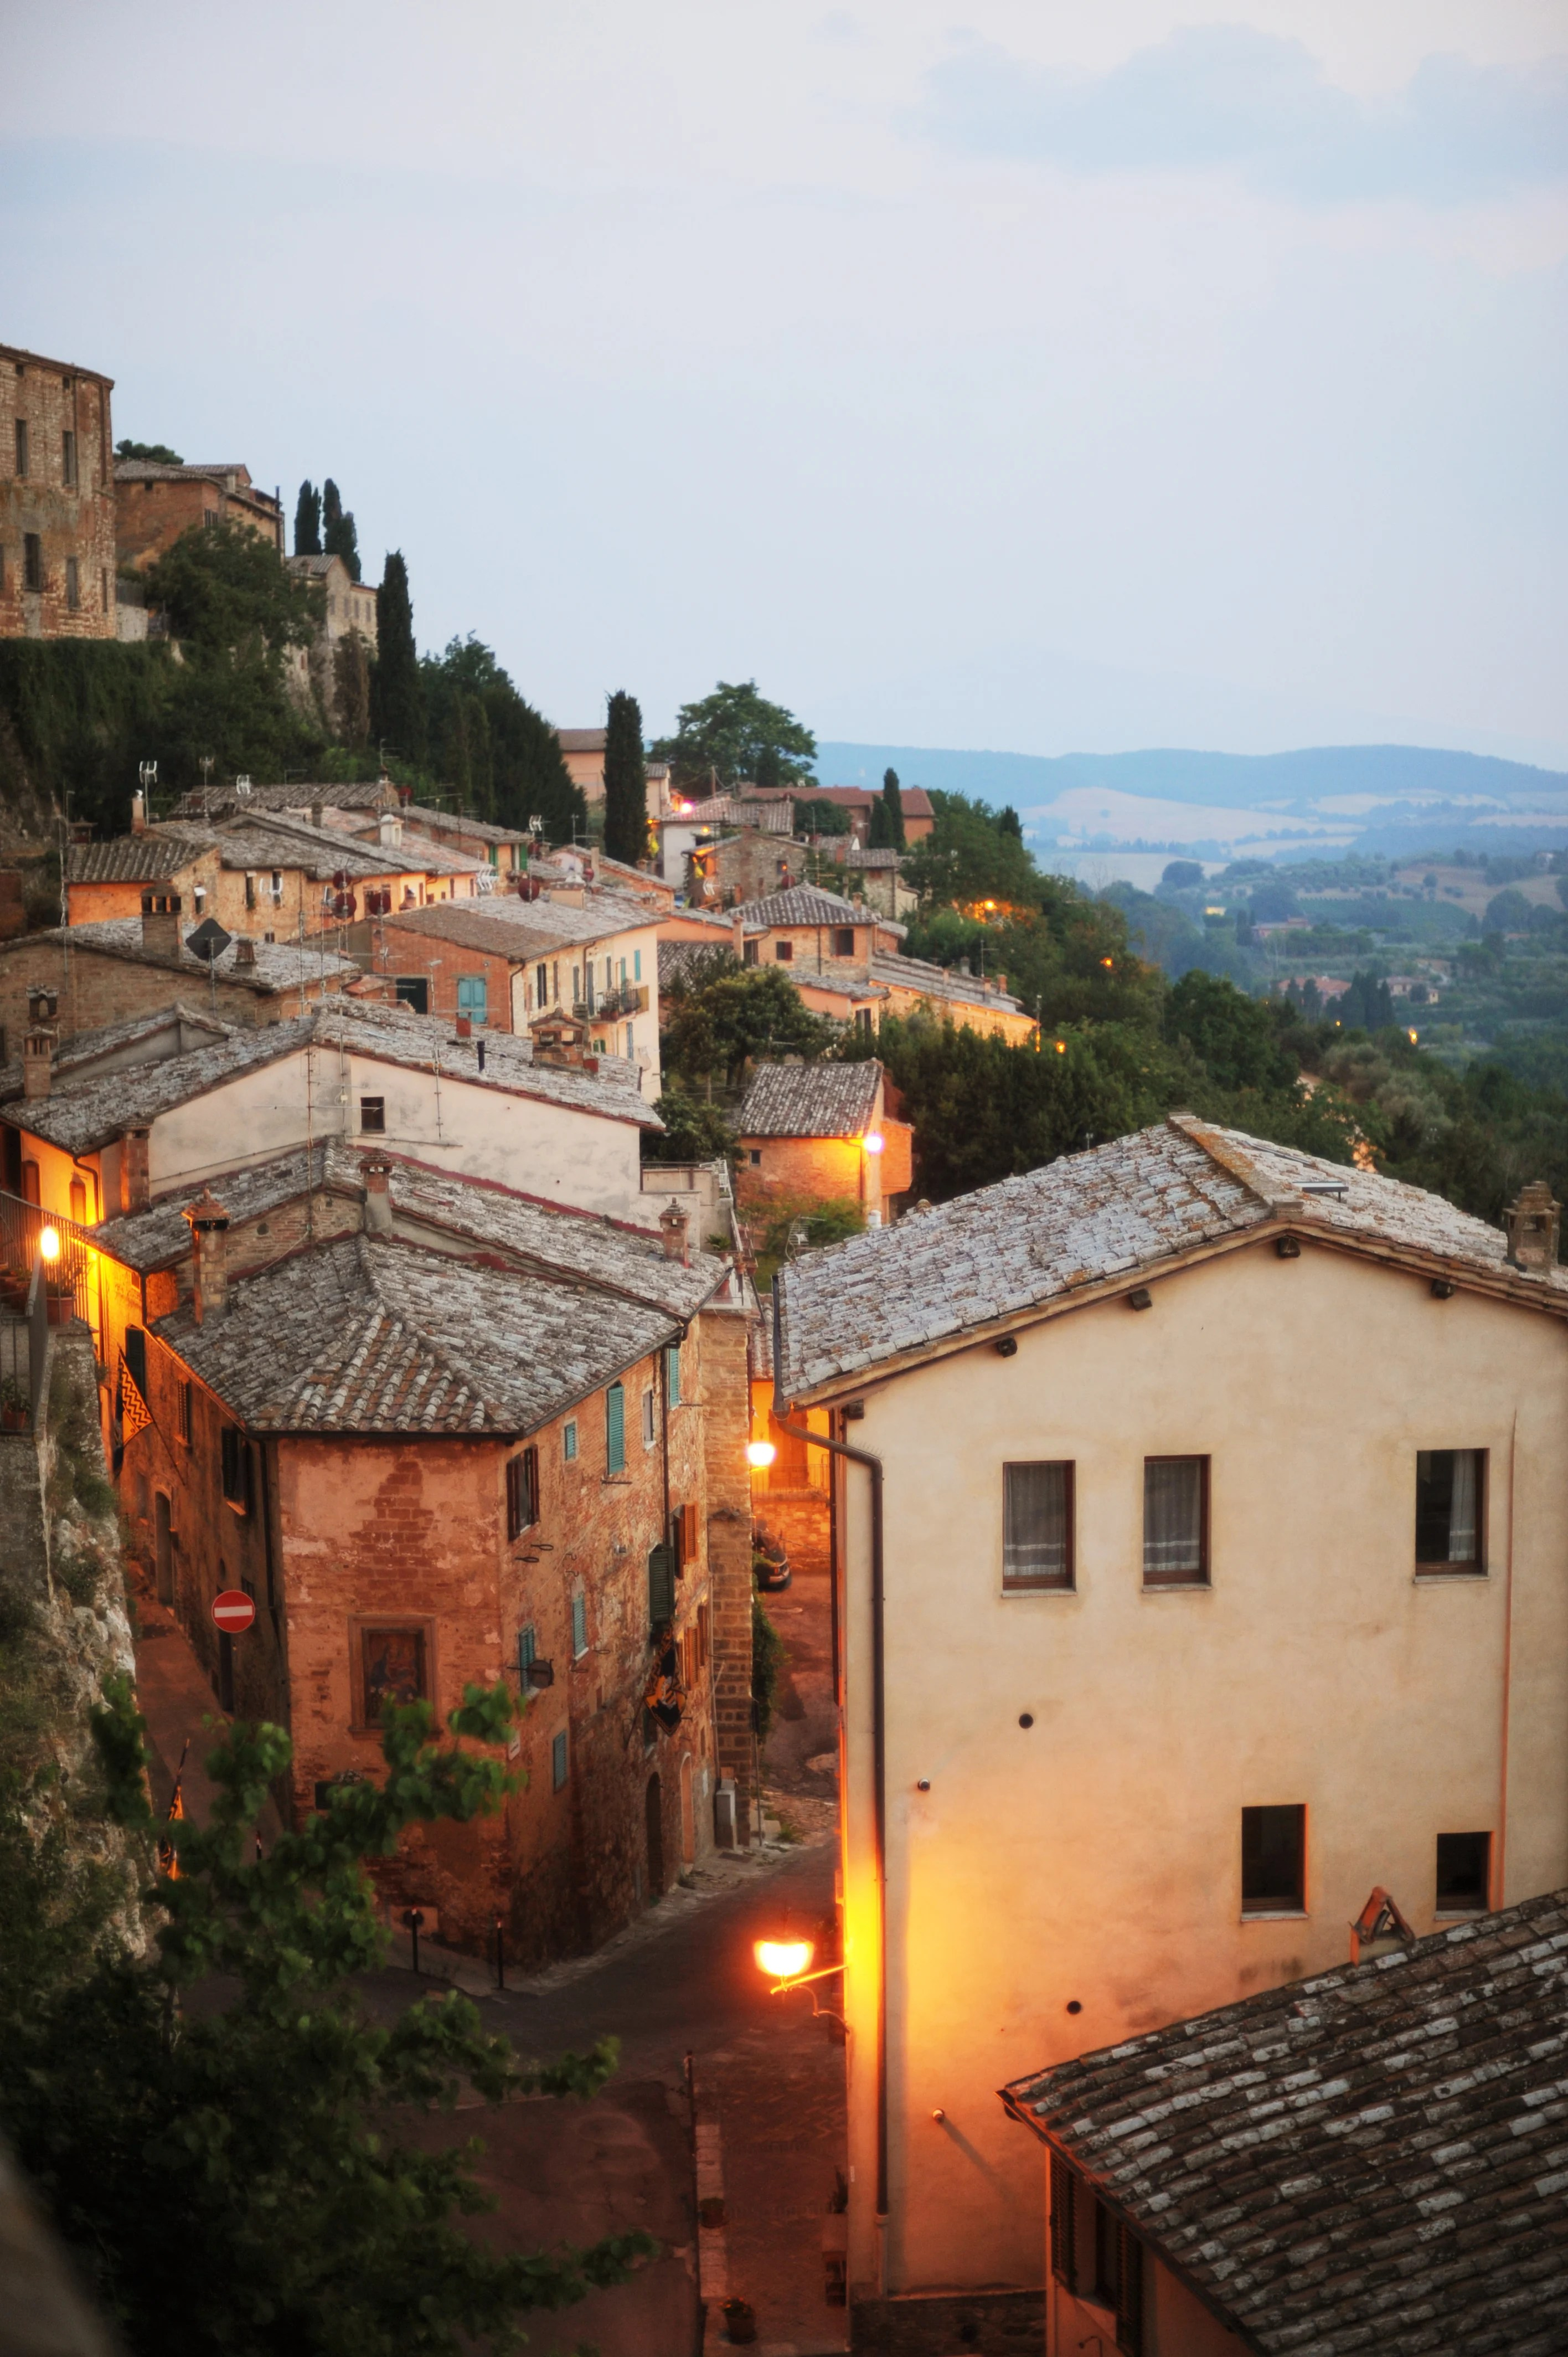 the best views in montepulciano